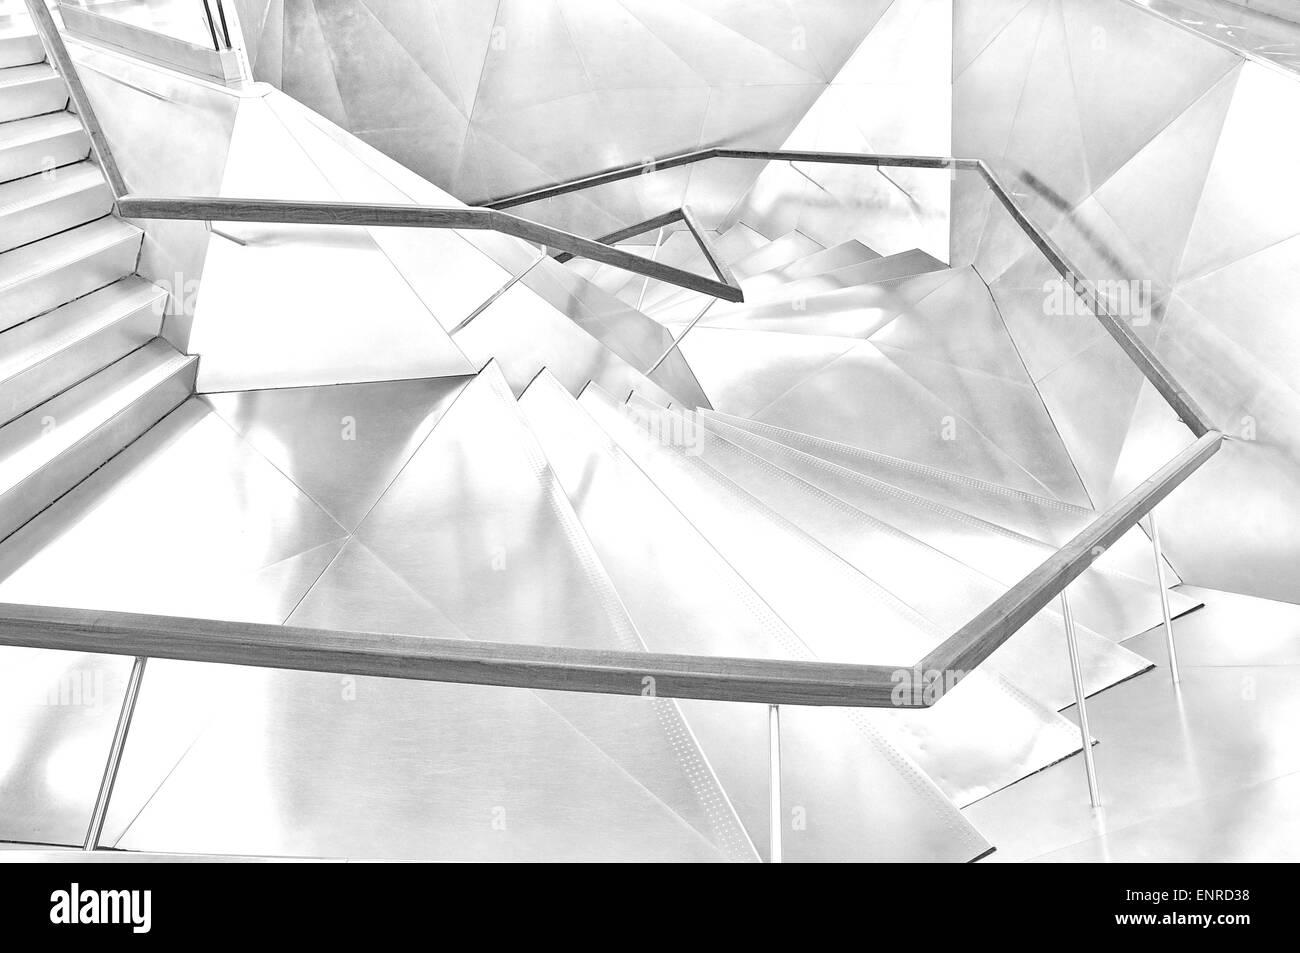 Triangle shape stairways - Stock Image